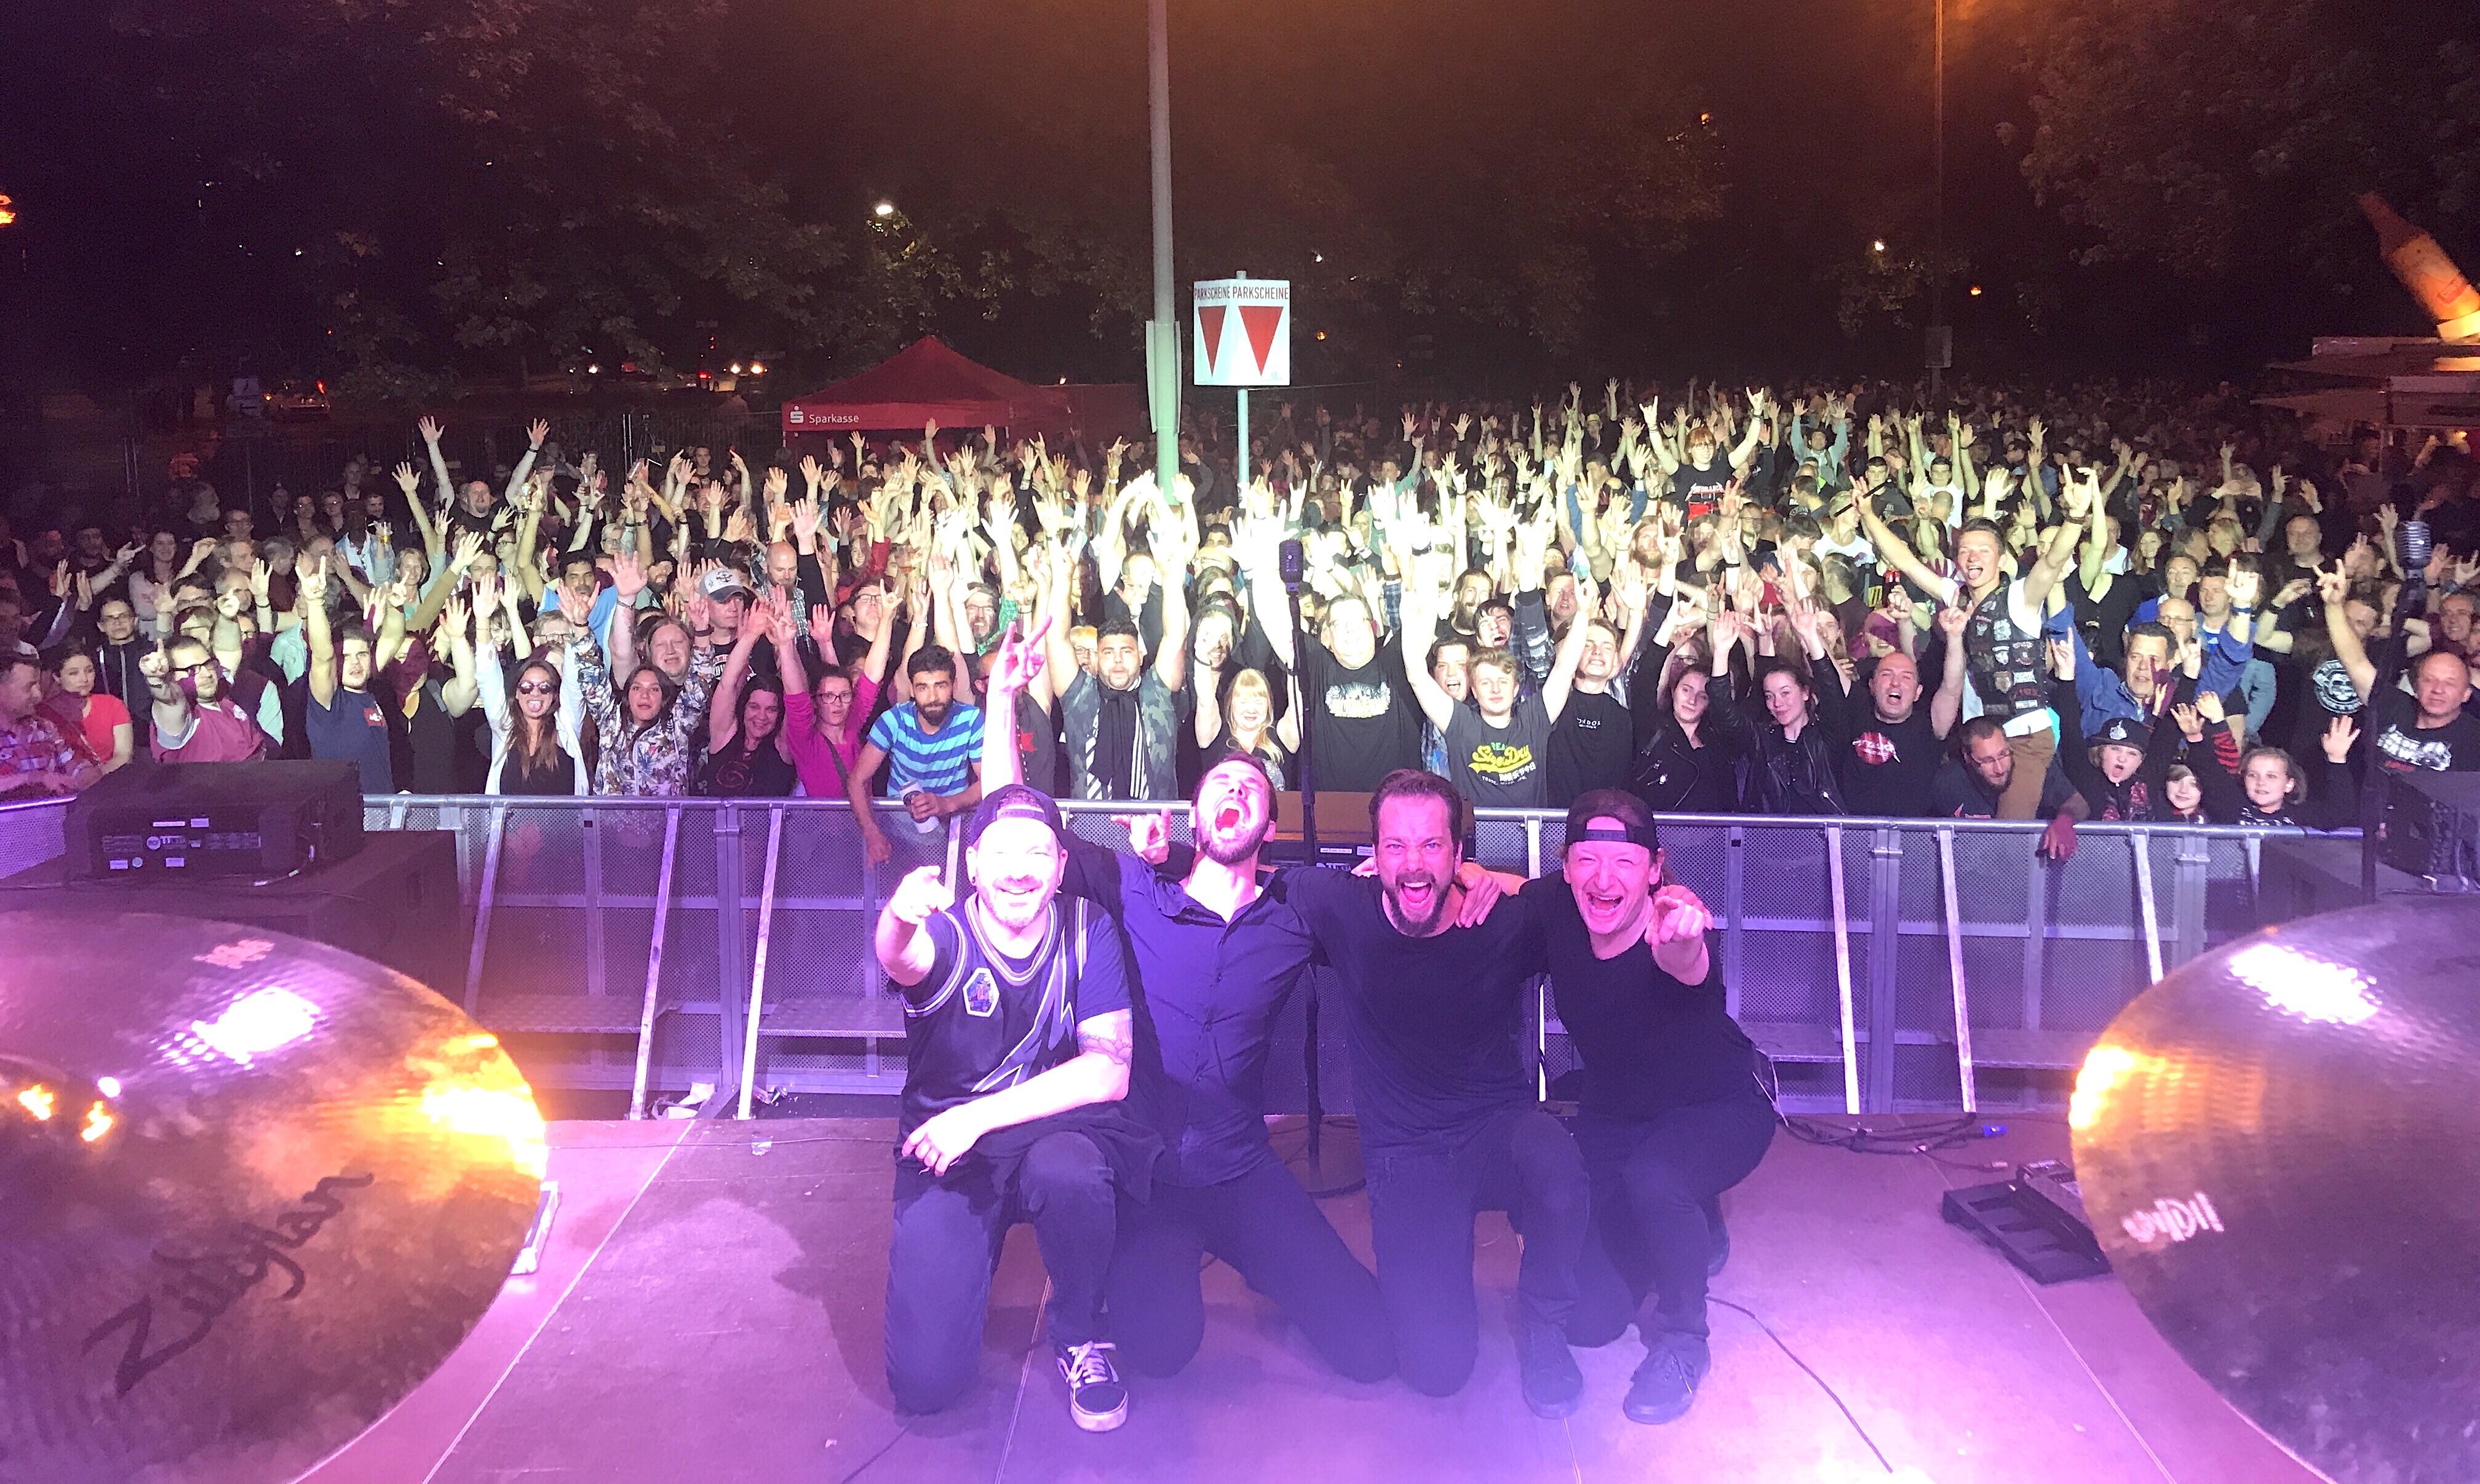 mytallica-hattingen-altstadtfest-2018-buehne-bunker-thank-you-fans